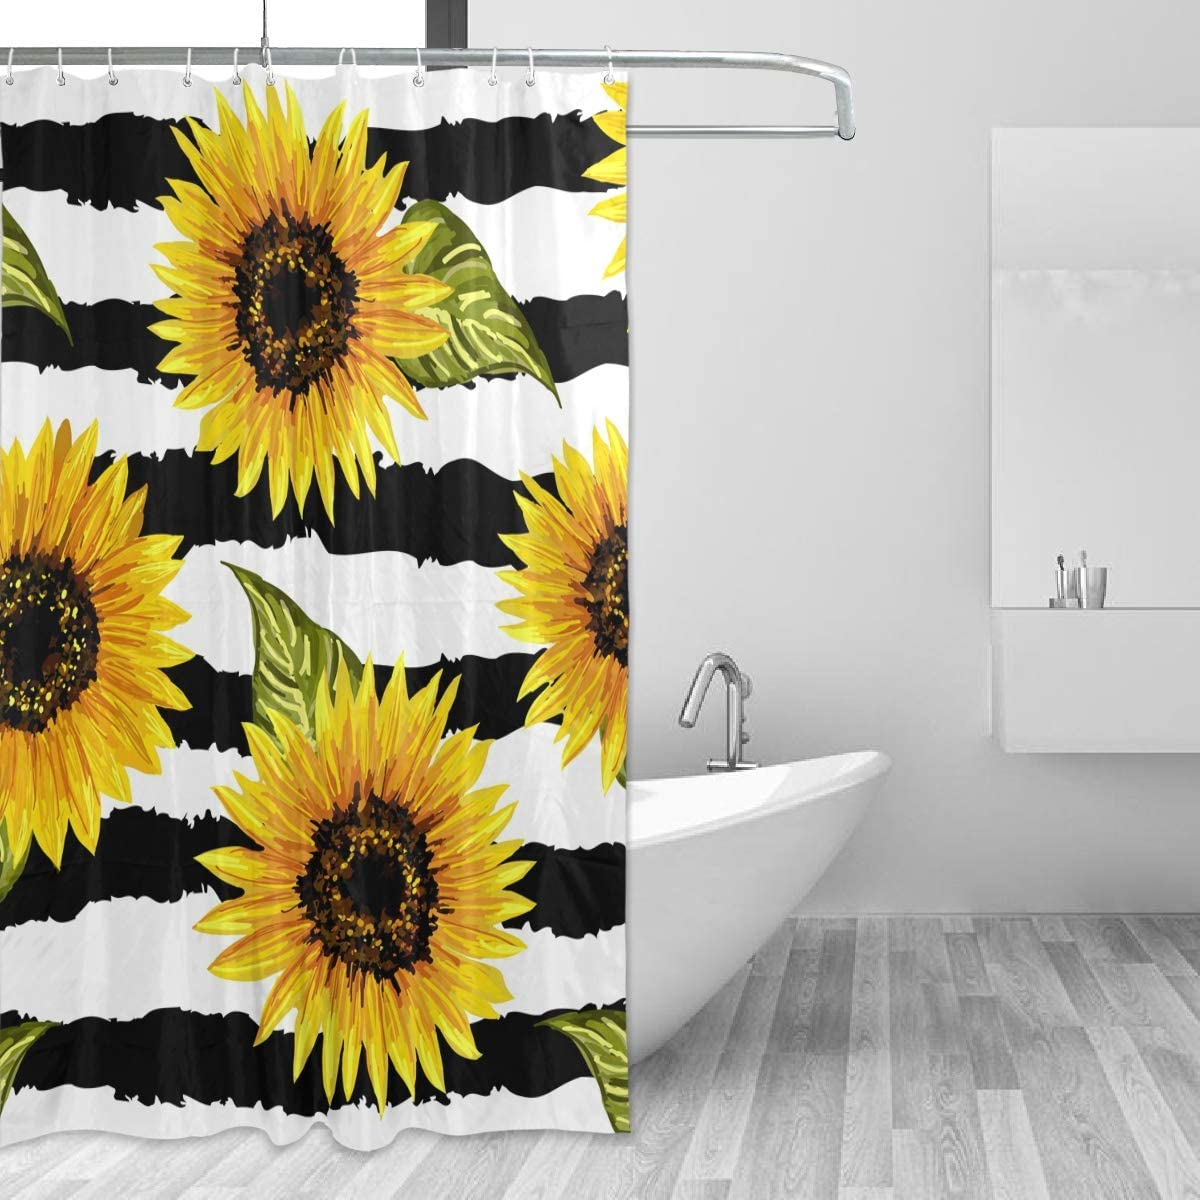 Sunflower flower black background Shower Curtain Bathroom Fabric /& 12hooks 71in